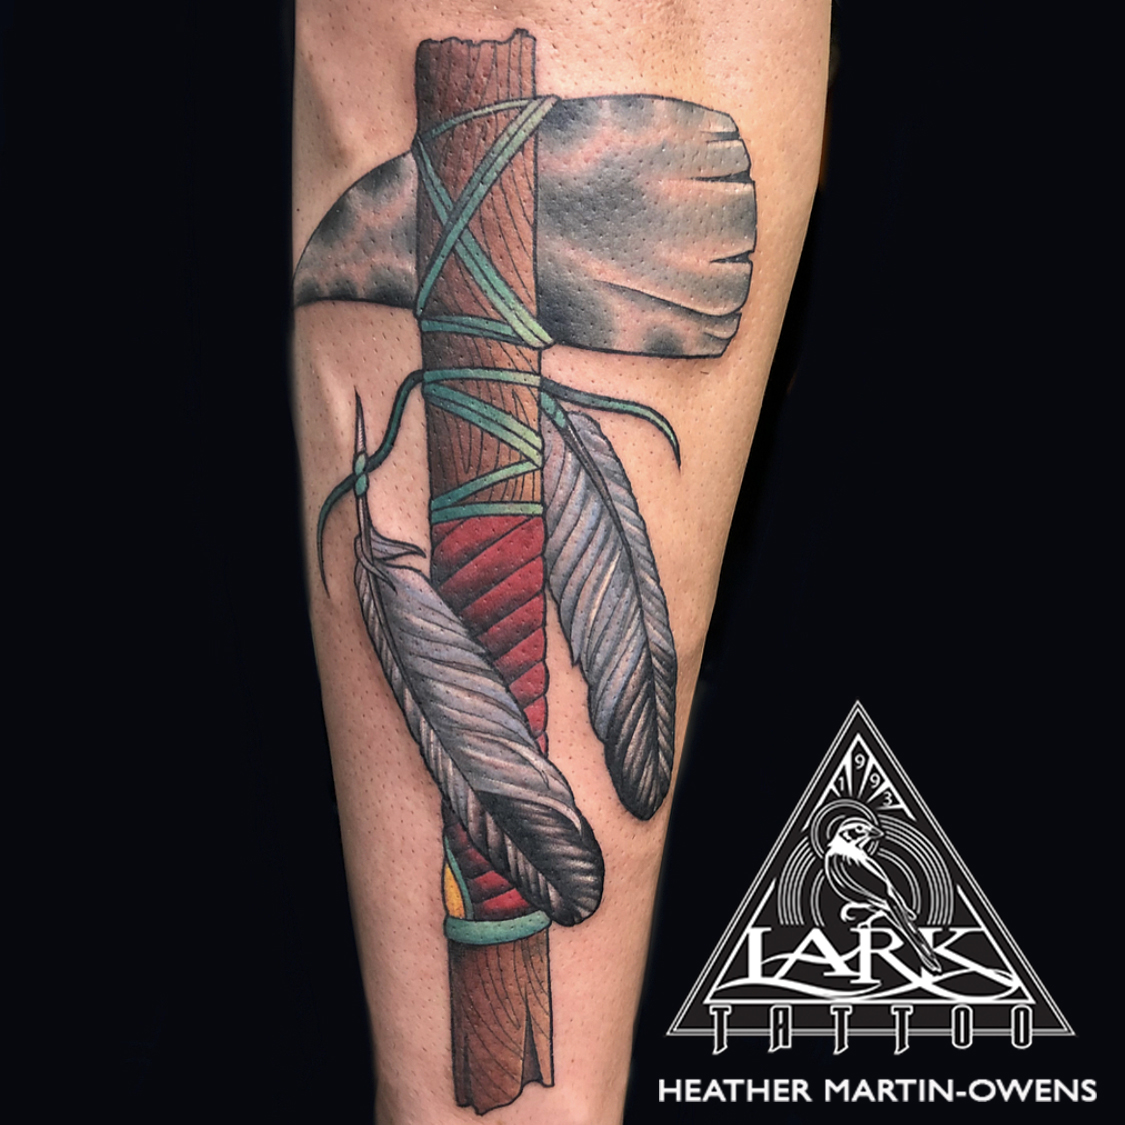 tomahawk, tomahawktattoo, colortattoo, colortattoos, neotraditional, neotraditionaltattoo, neotraditionaltattoos, neotraditionaltattooer, neotraditionaltattooers, feather, feathertattoo, femaletattooer, femaletattooist, tattoo, tattoos, tat, tats, tatts, tatted, tattedup, tattoist, tattooed, inked, inkedup, ink, tattoooftheday, amazingink, bodyart, tattooig, tattoosofinstagram, instatats , larktattoo, larktattoos, larktattoowestbury, westbury, longisland, NY, NewYork, usa, art